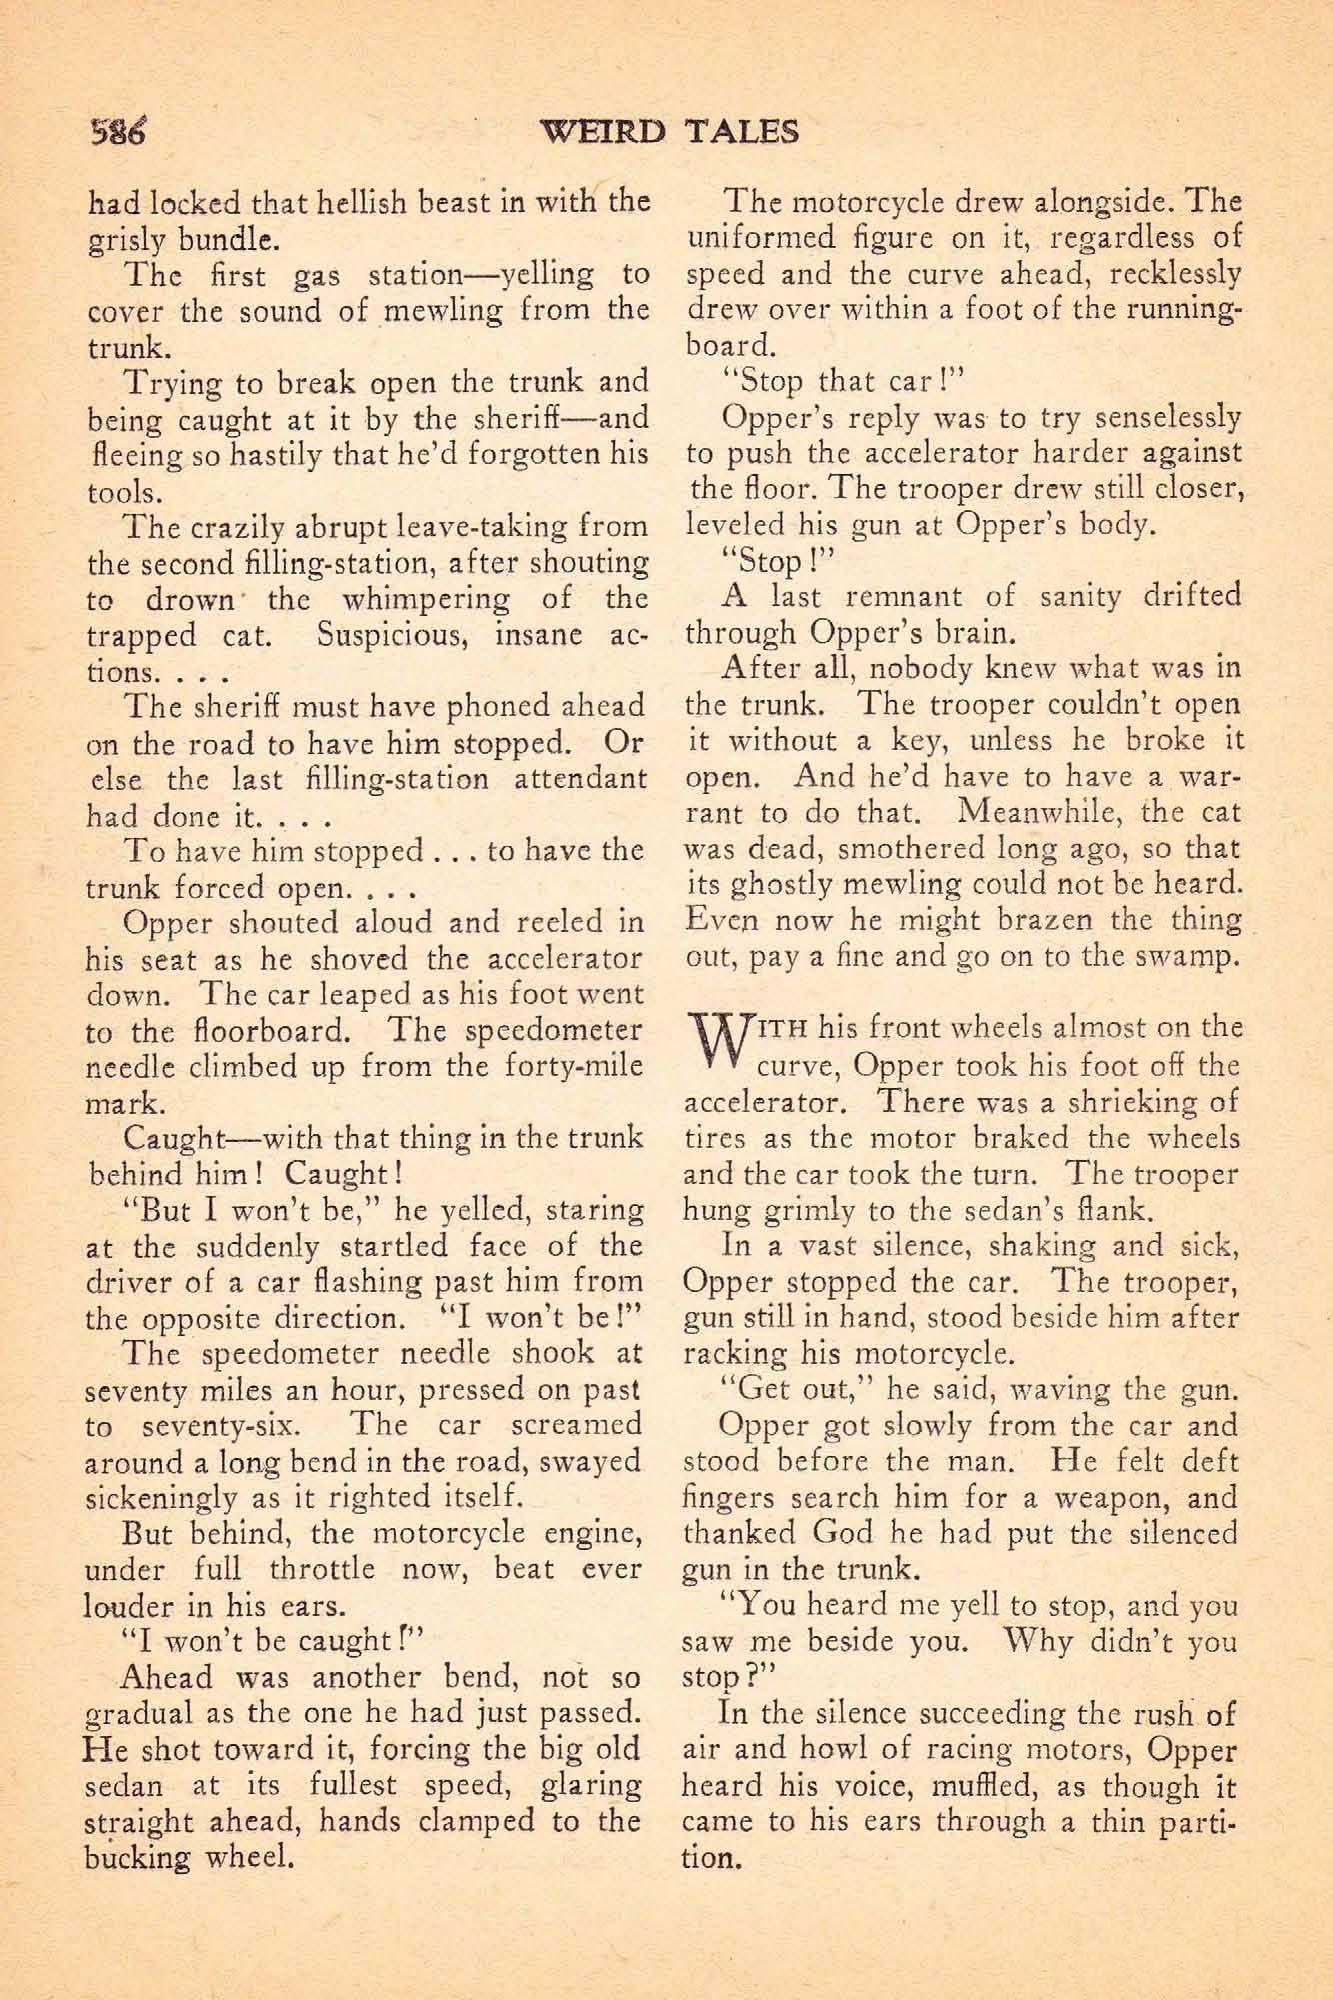 Weird Tales Vol 32 No 5 November 1938 Ed By Farnsworth Wright